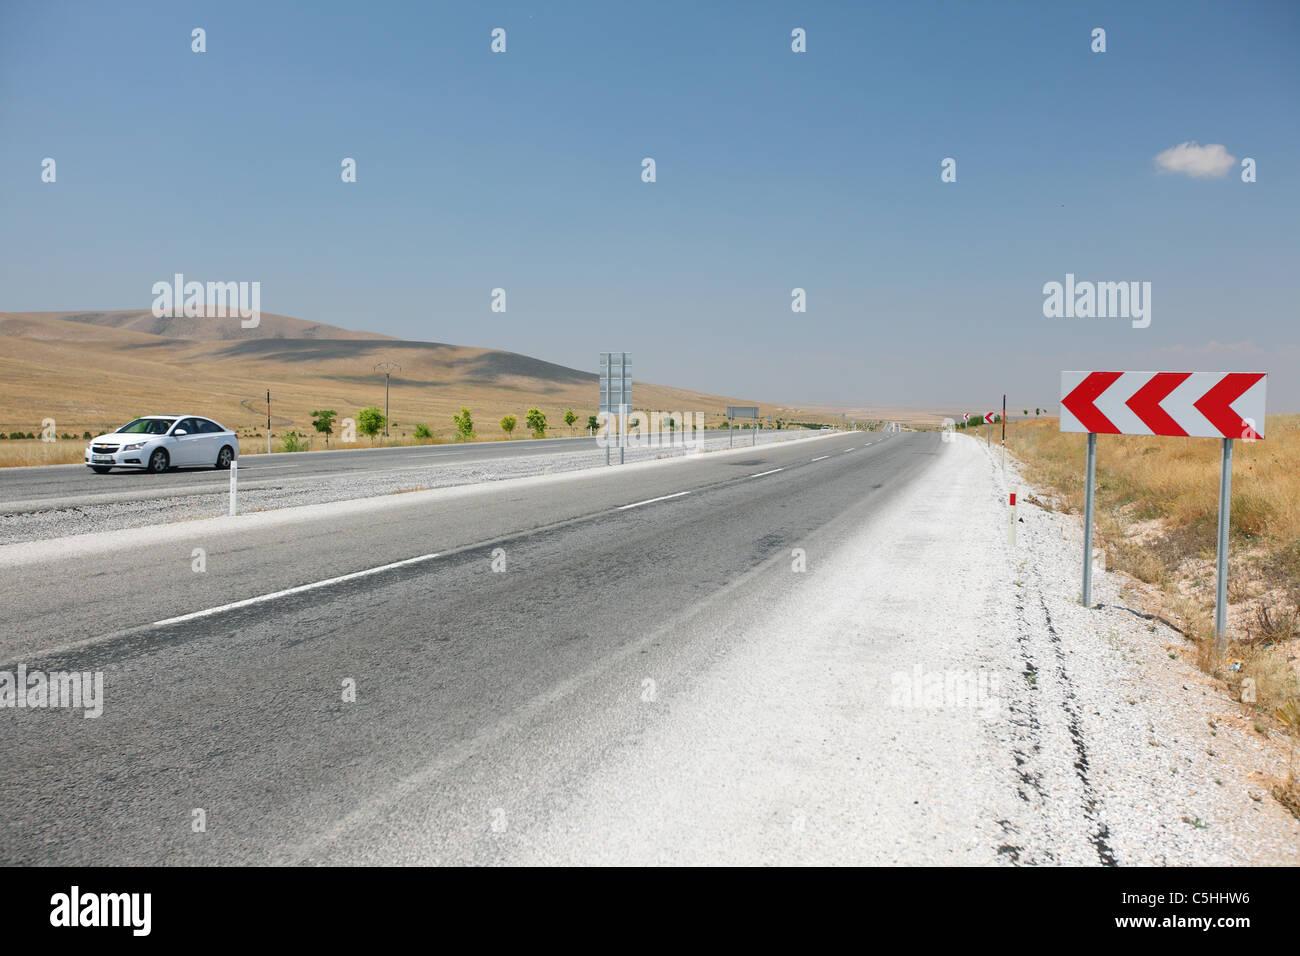 Turkey, Central Anatolia, Konya, driving on road D300 - Stock Image